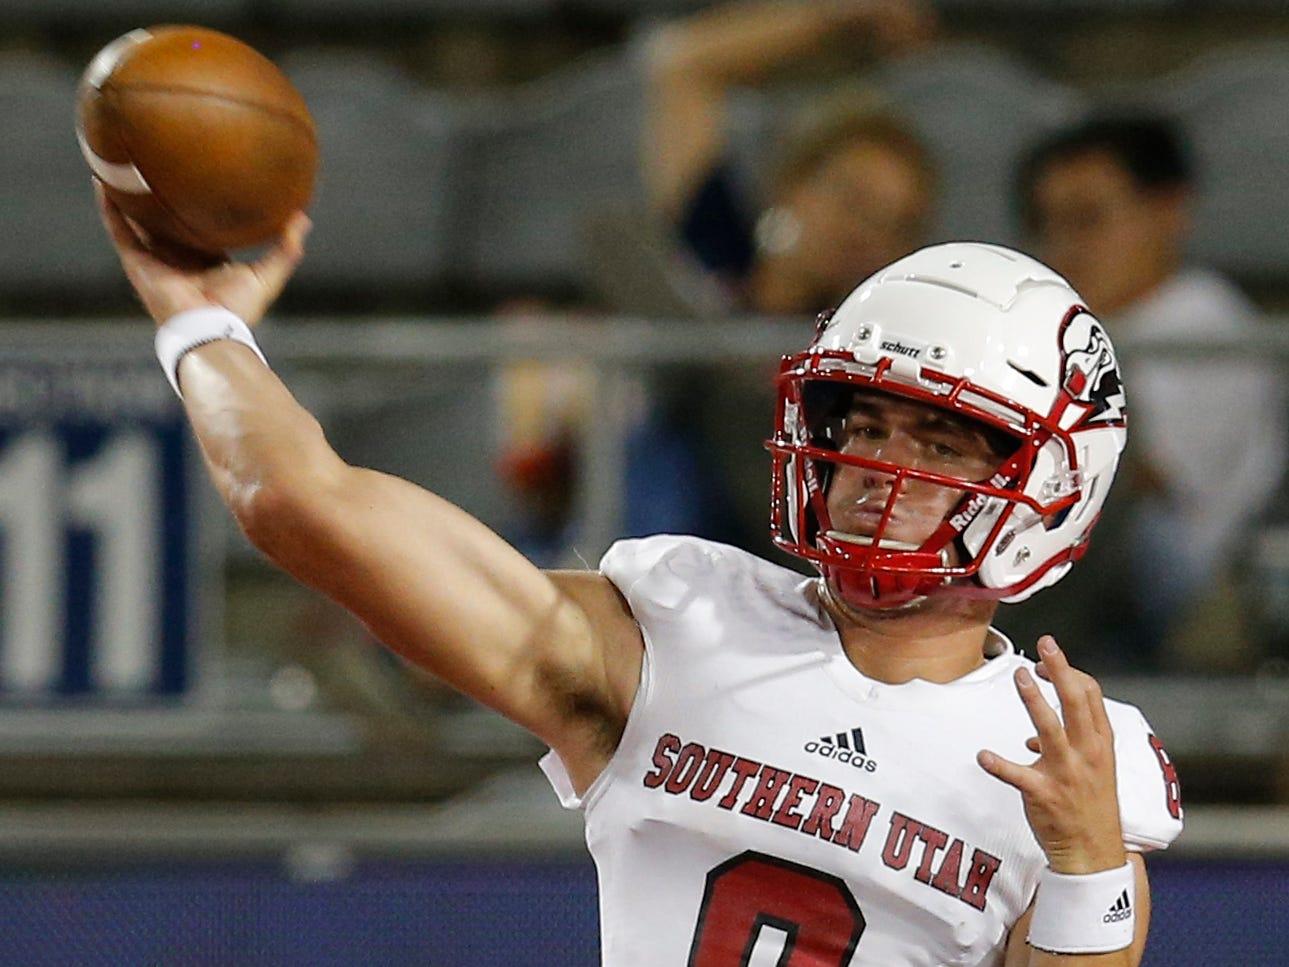 Southern Utah quarterback Chris Helbig warms up before an NCAA college football game against Arizona, Saturday, Sept. 15, 2018, in Tucson, Ariz. (AP Photo/Rick Scuteri)